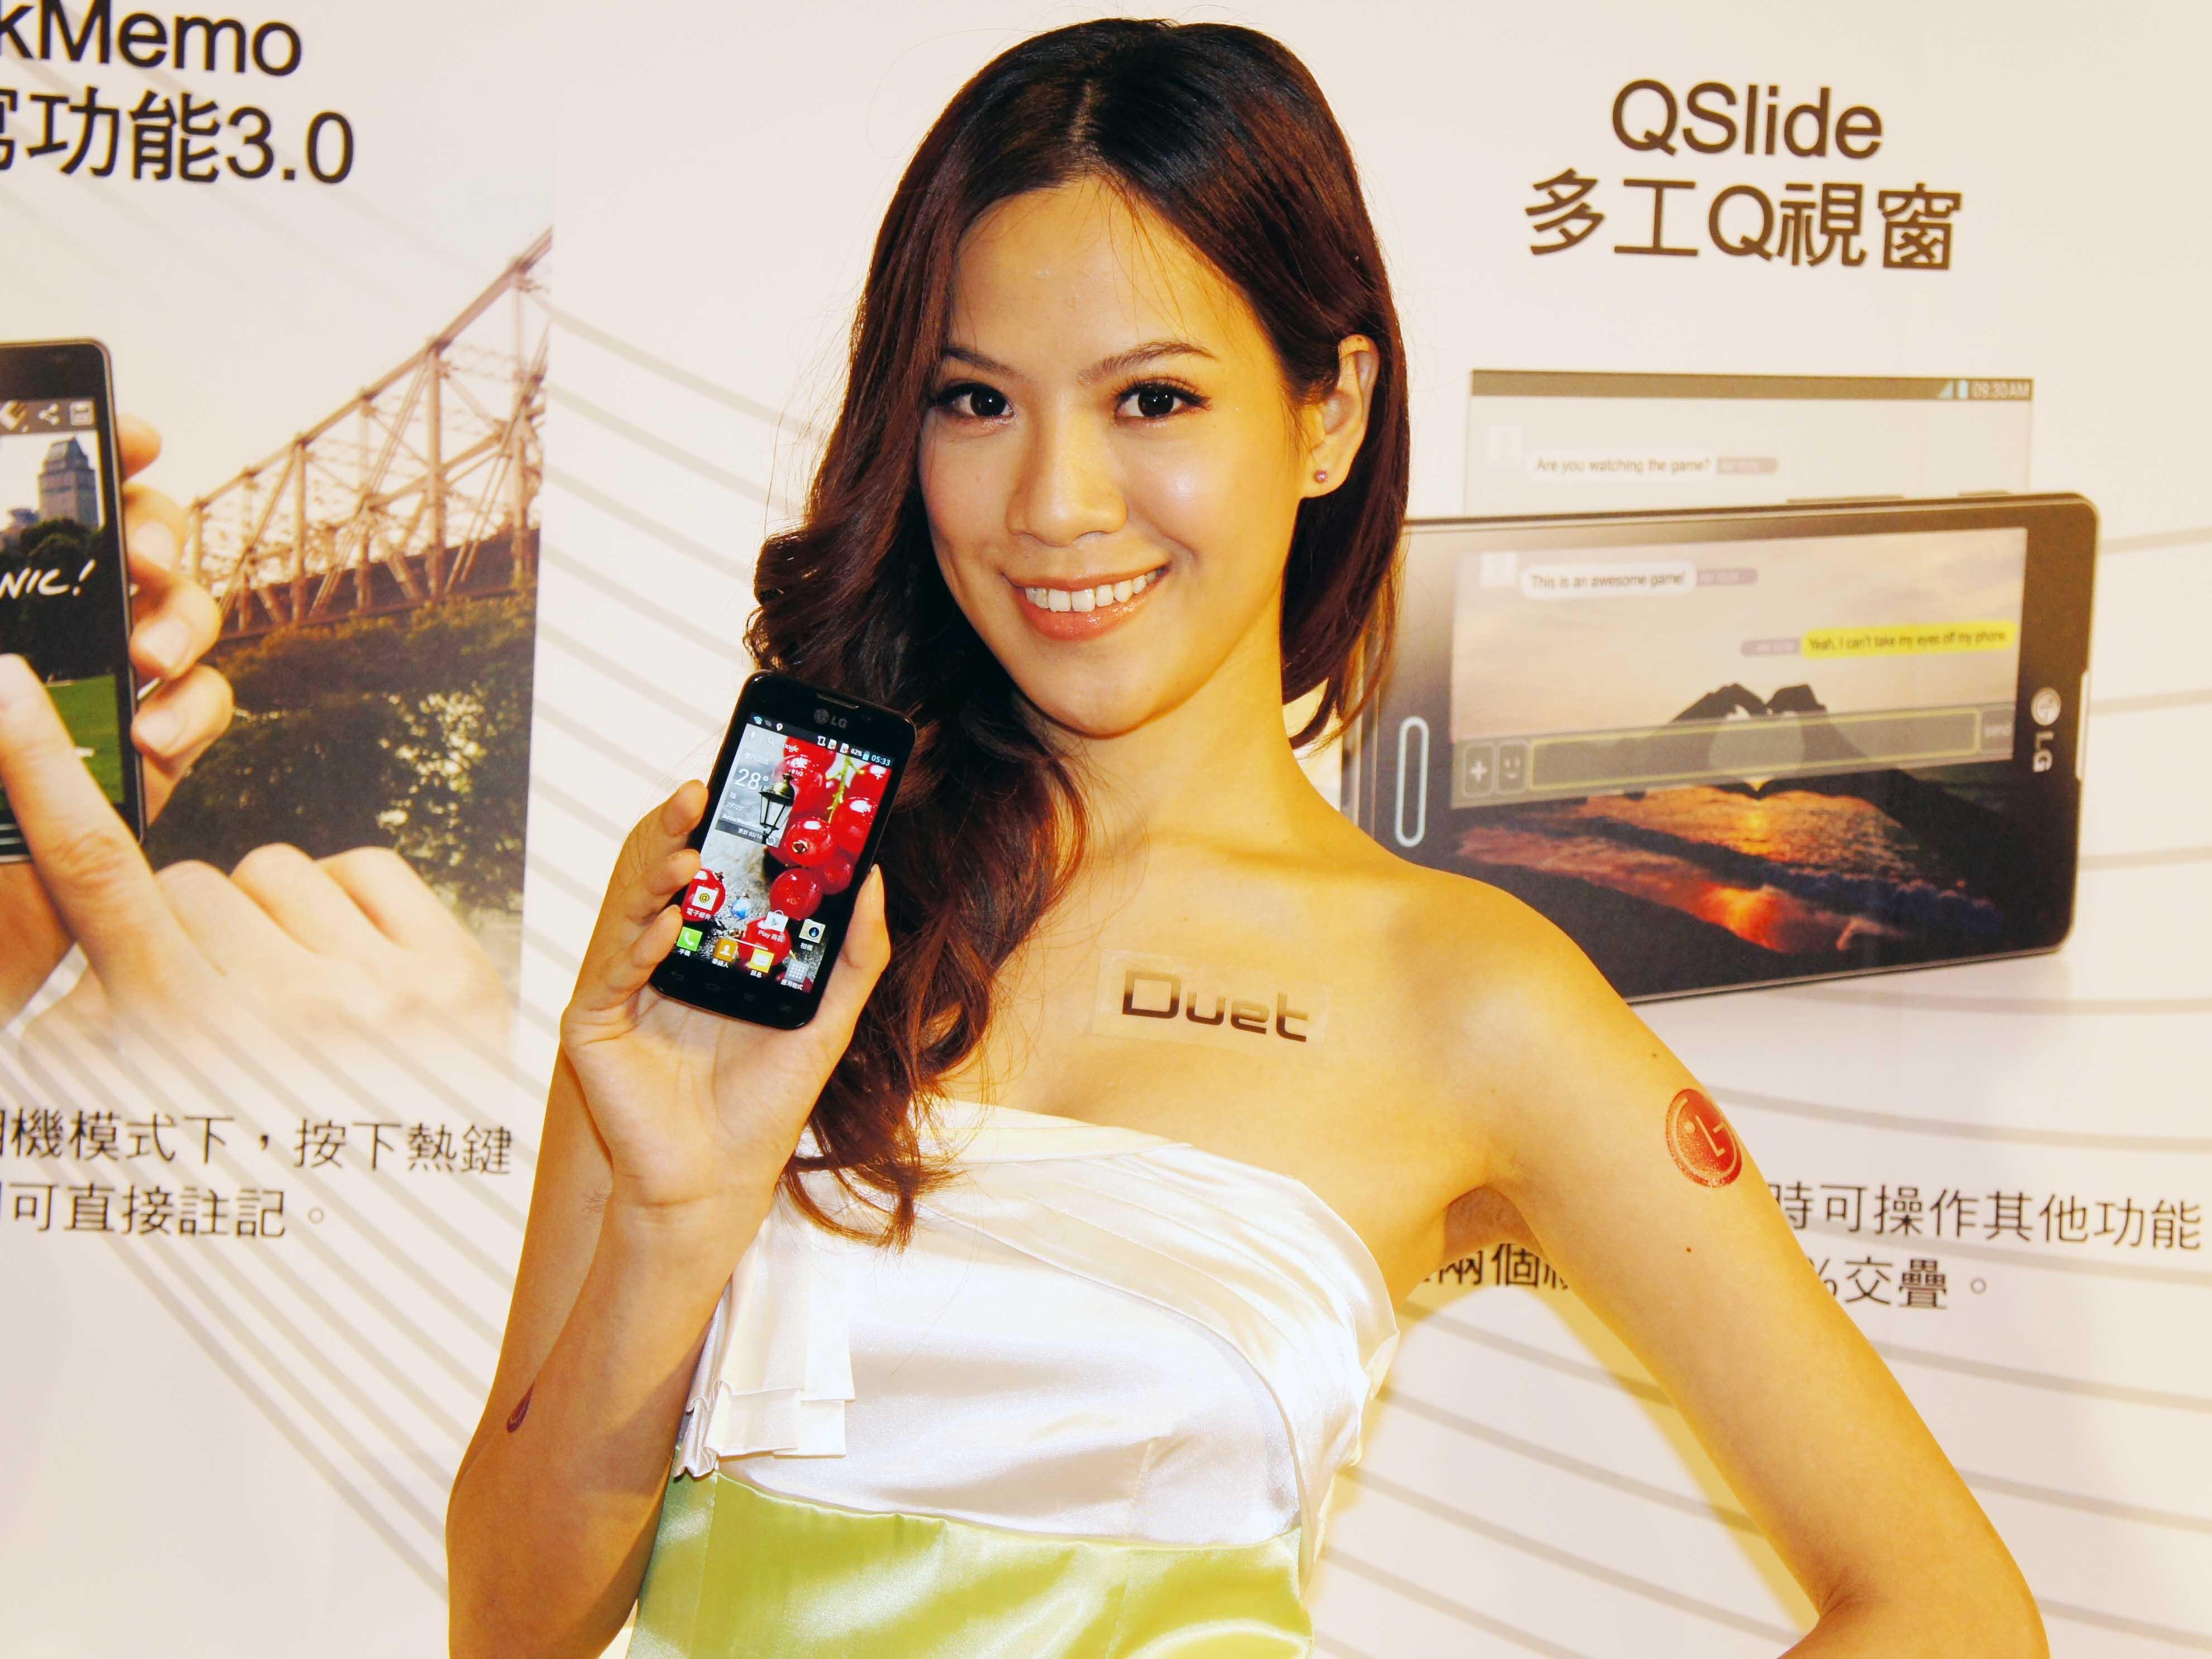 MWC 兩款新手機 LG L5 II、L7II 在台發表,四大新功能現場動手玩